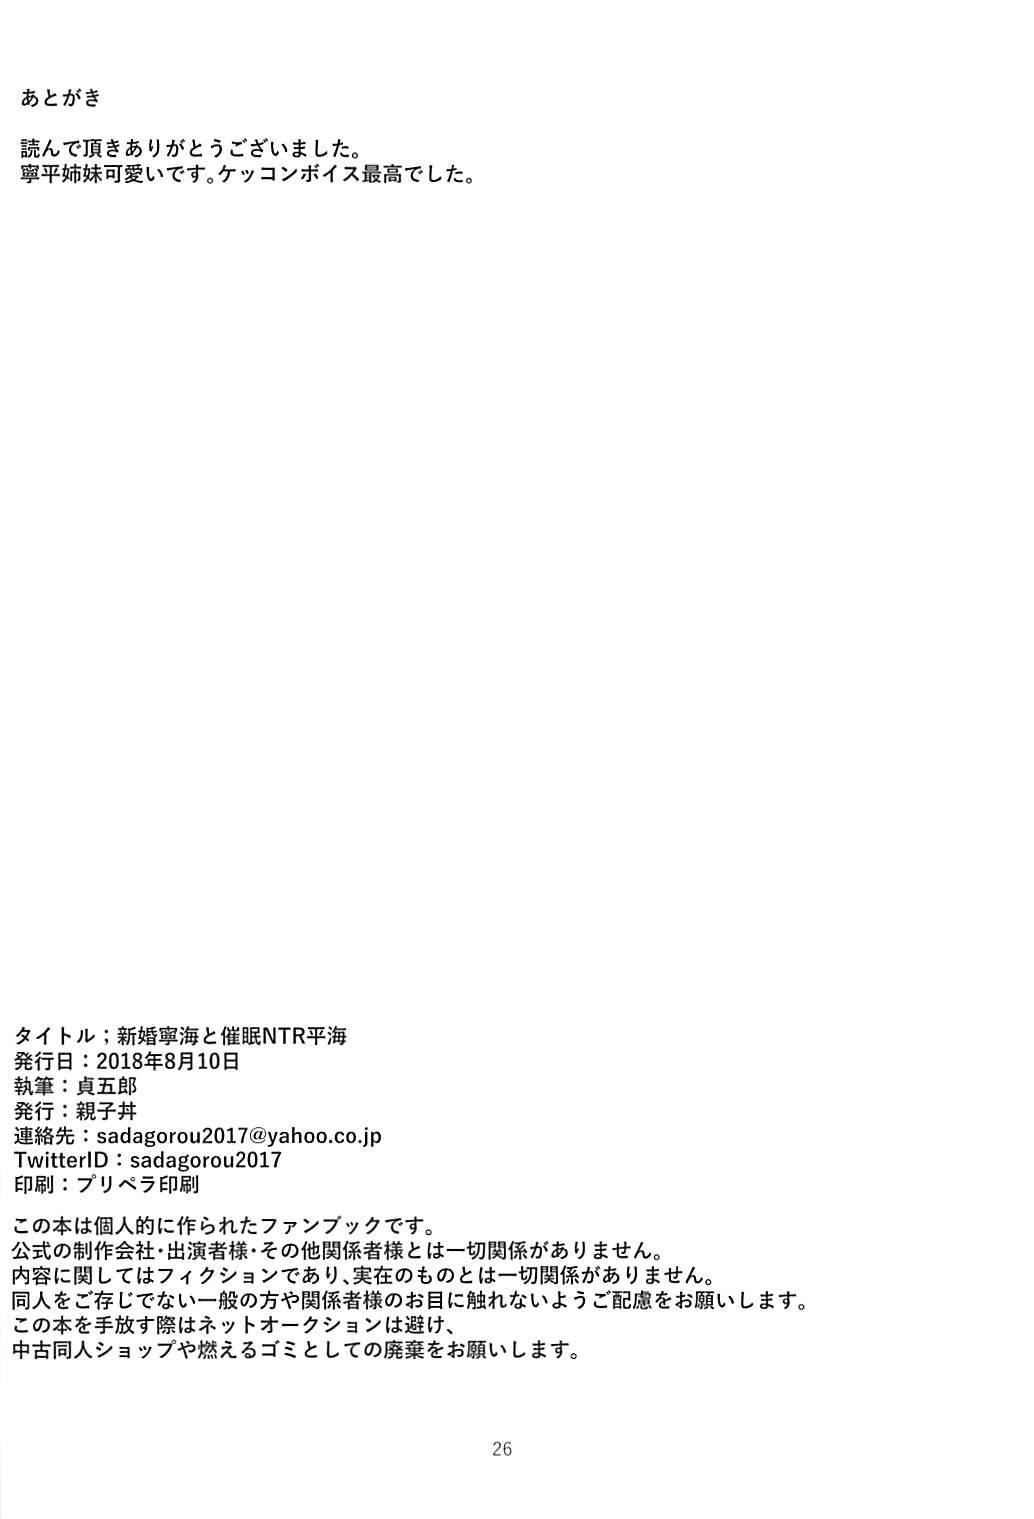 Shinkon Ninghai to Saimin NTR Pinghai 24